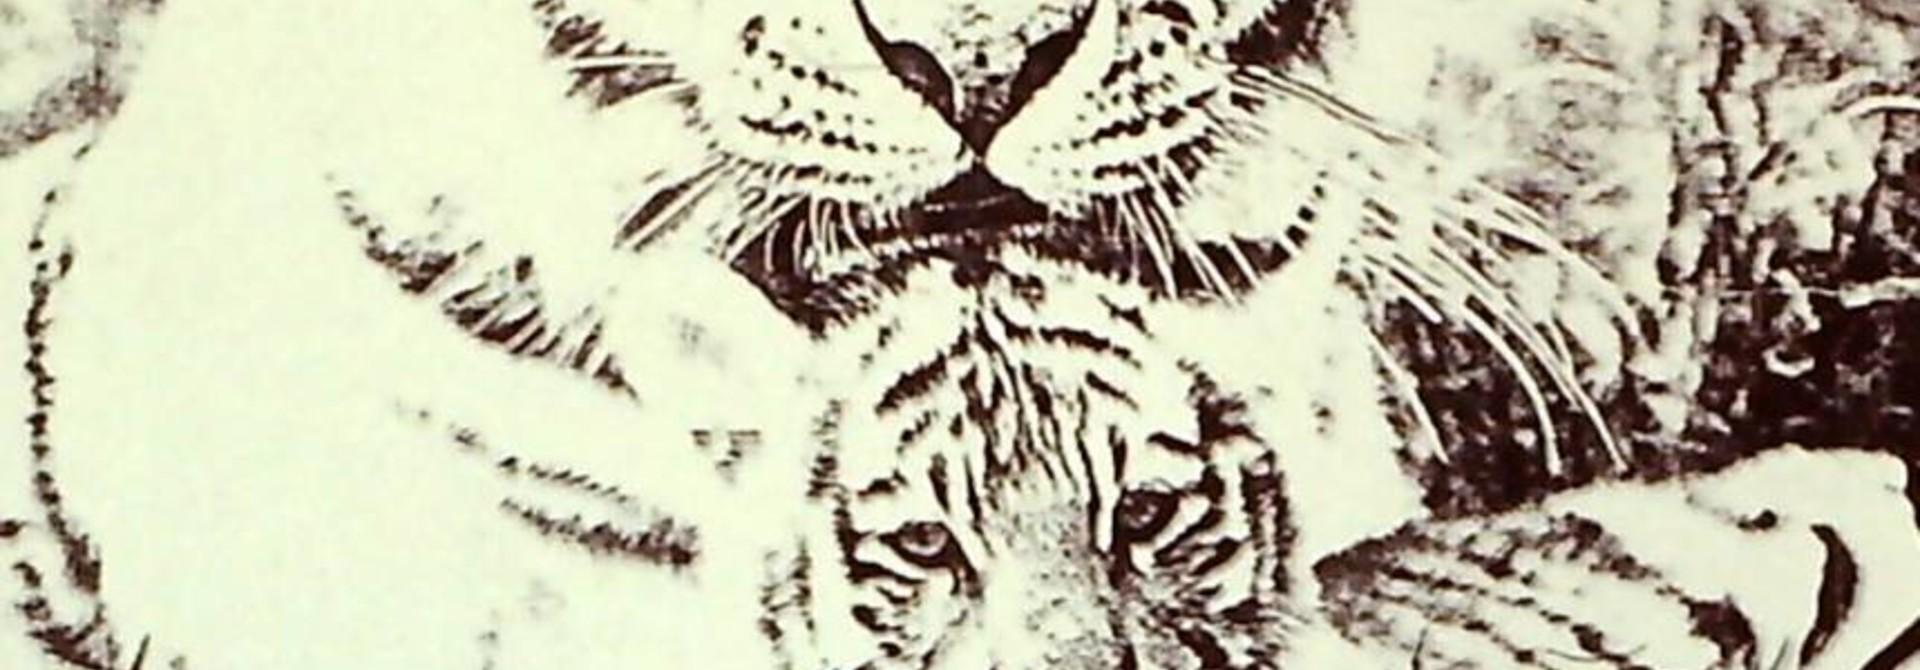 Black & White Tigers